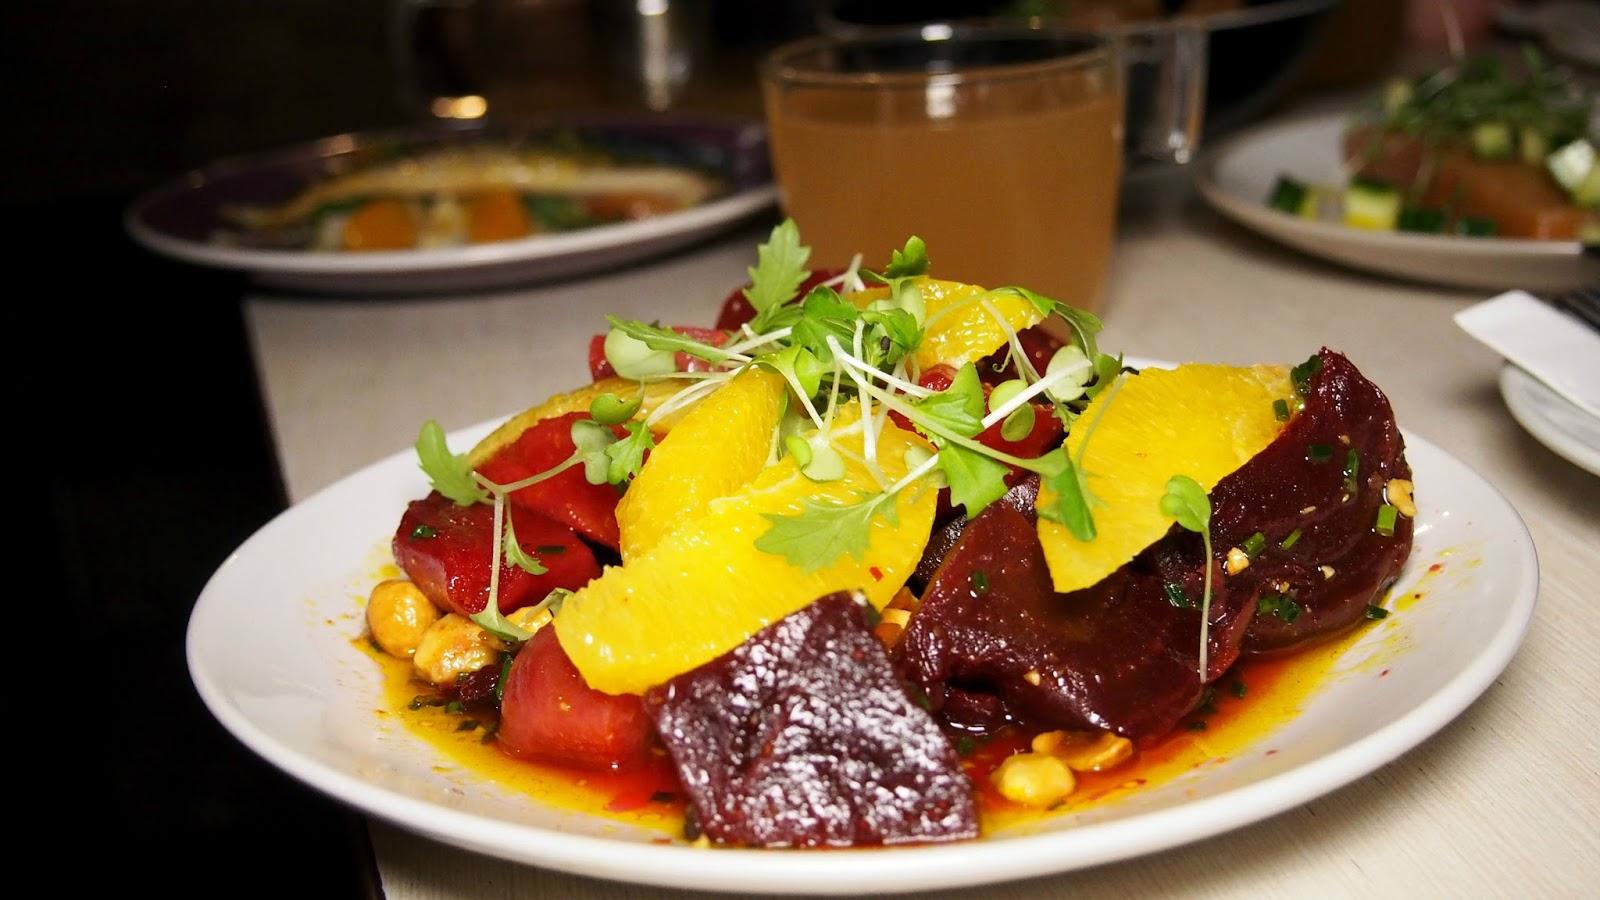 Beetroot and Hazelnut Salad